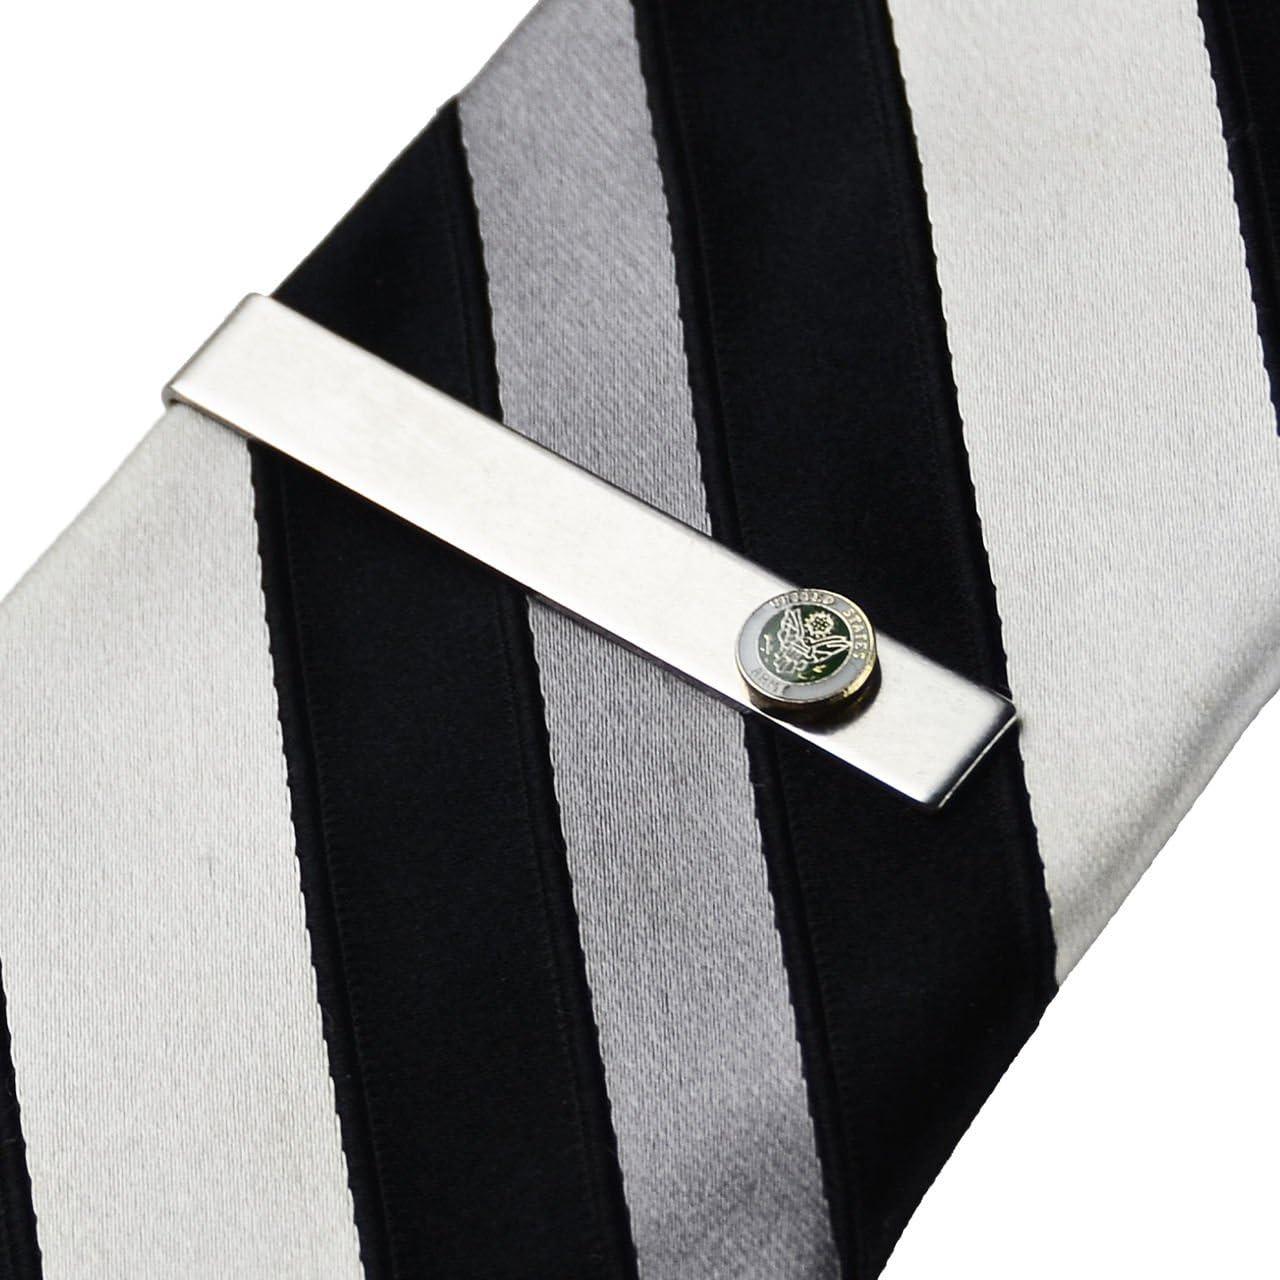 Quality Handcrafts Guaranteed Army Tie Clip